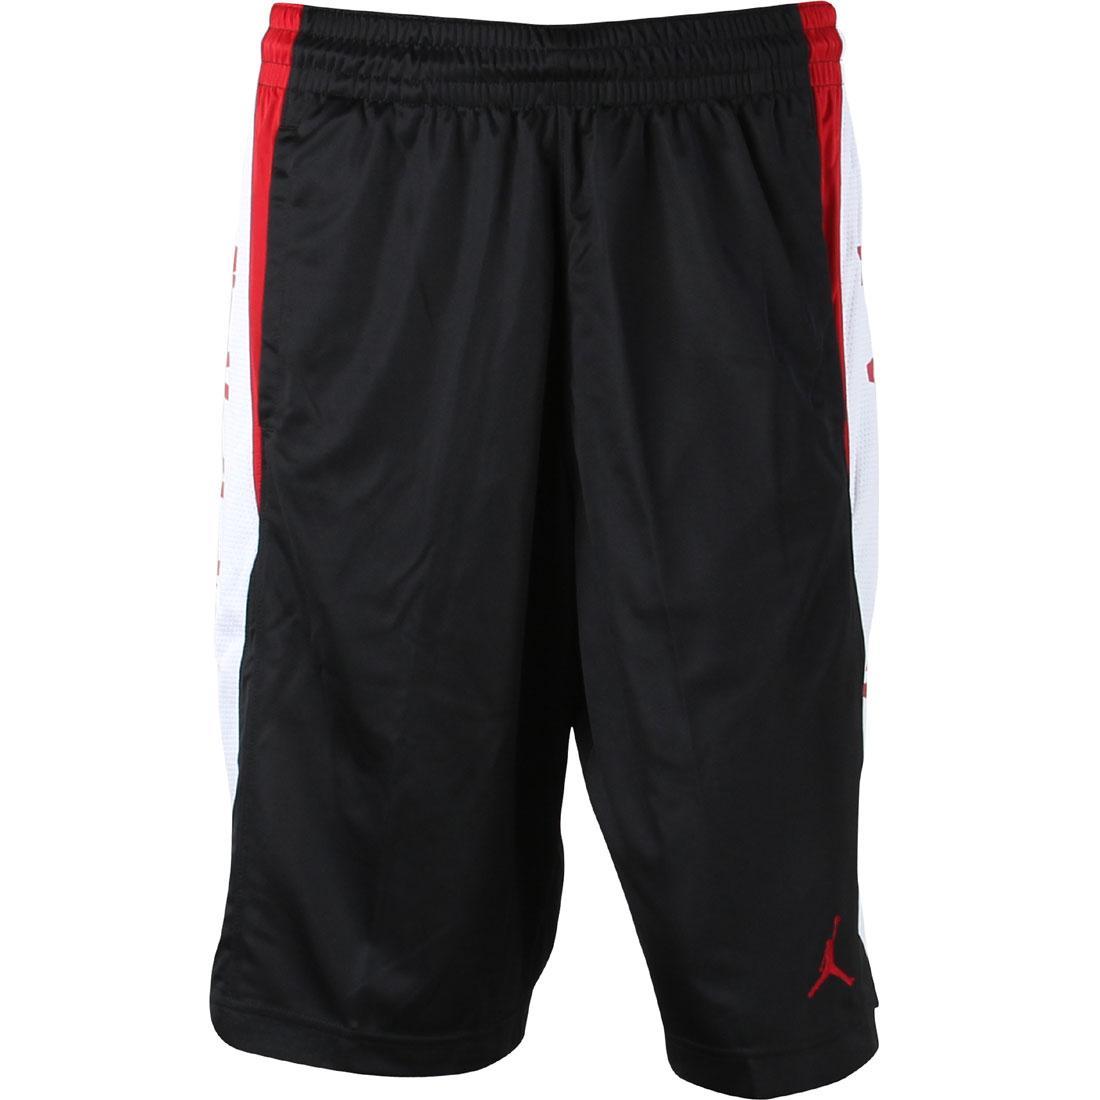 $45.00 724831-011 Jordan Men Takeover Basketball Shorts ...